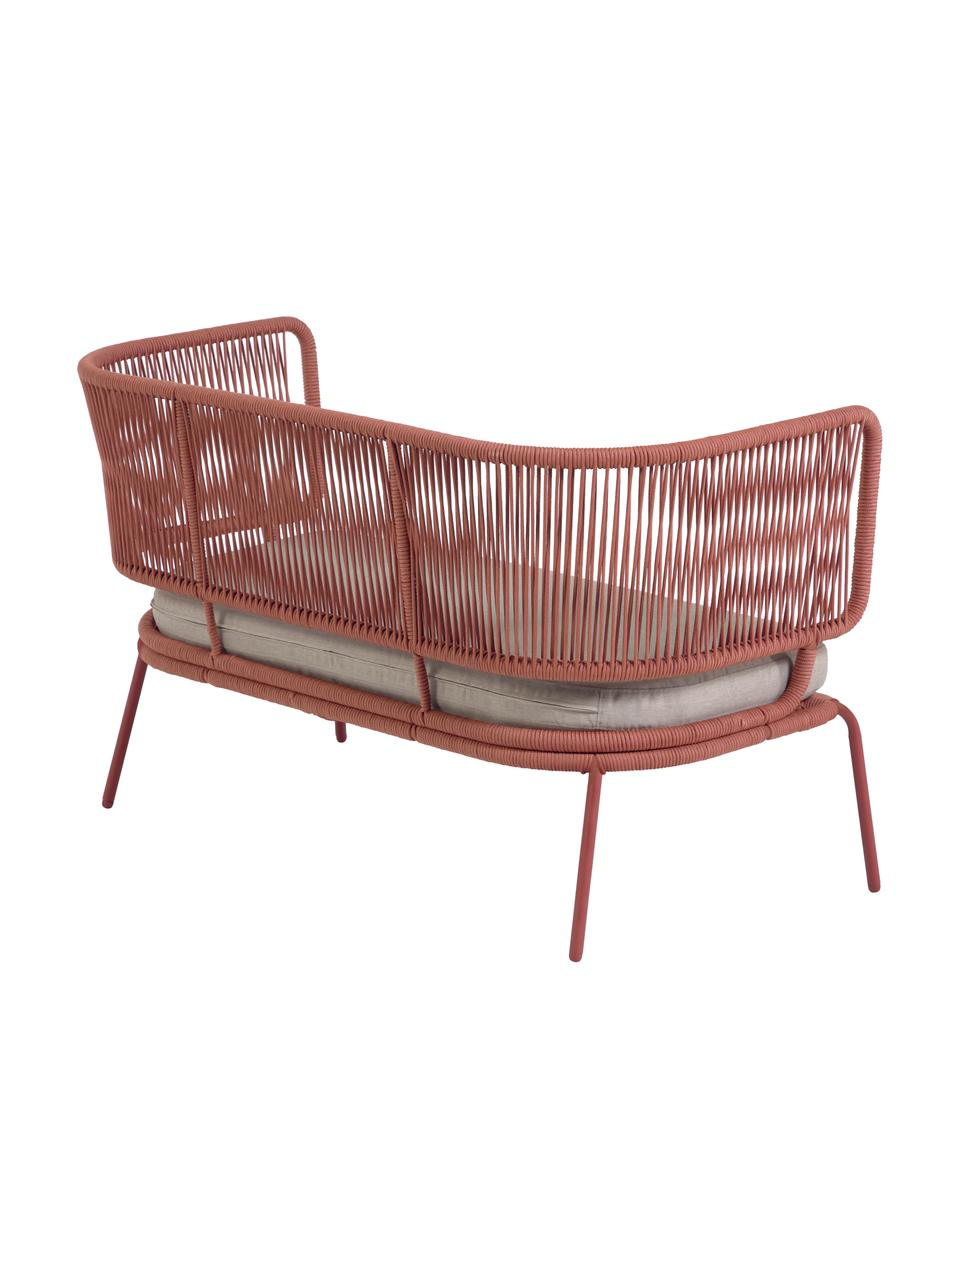 Garten-Loungesofa Nadin (2-Sitzer), Gestell: Metall, verzinkt und lack, Bezug: Polyester, Rosa, B 135 x T 65 cm